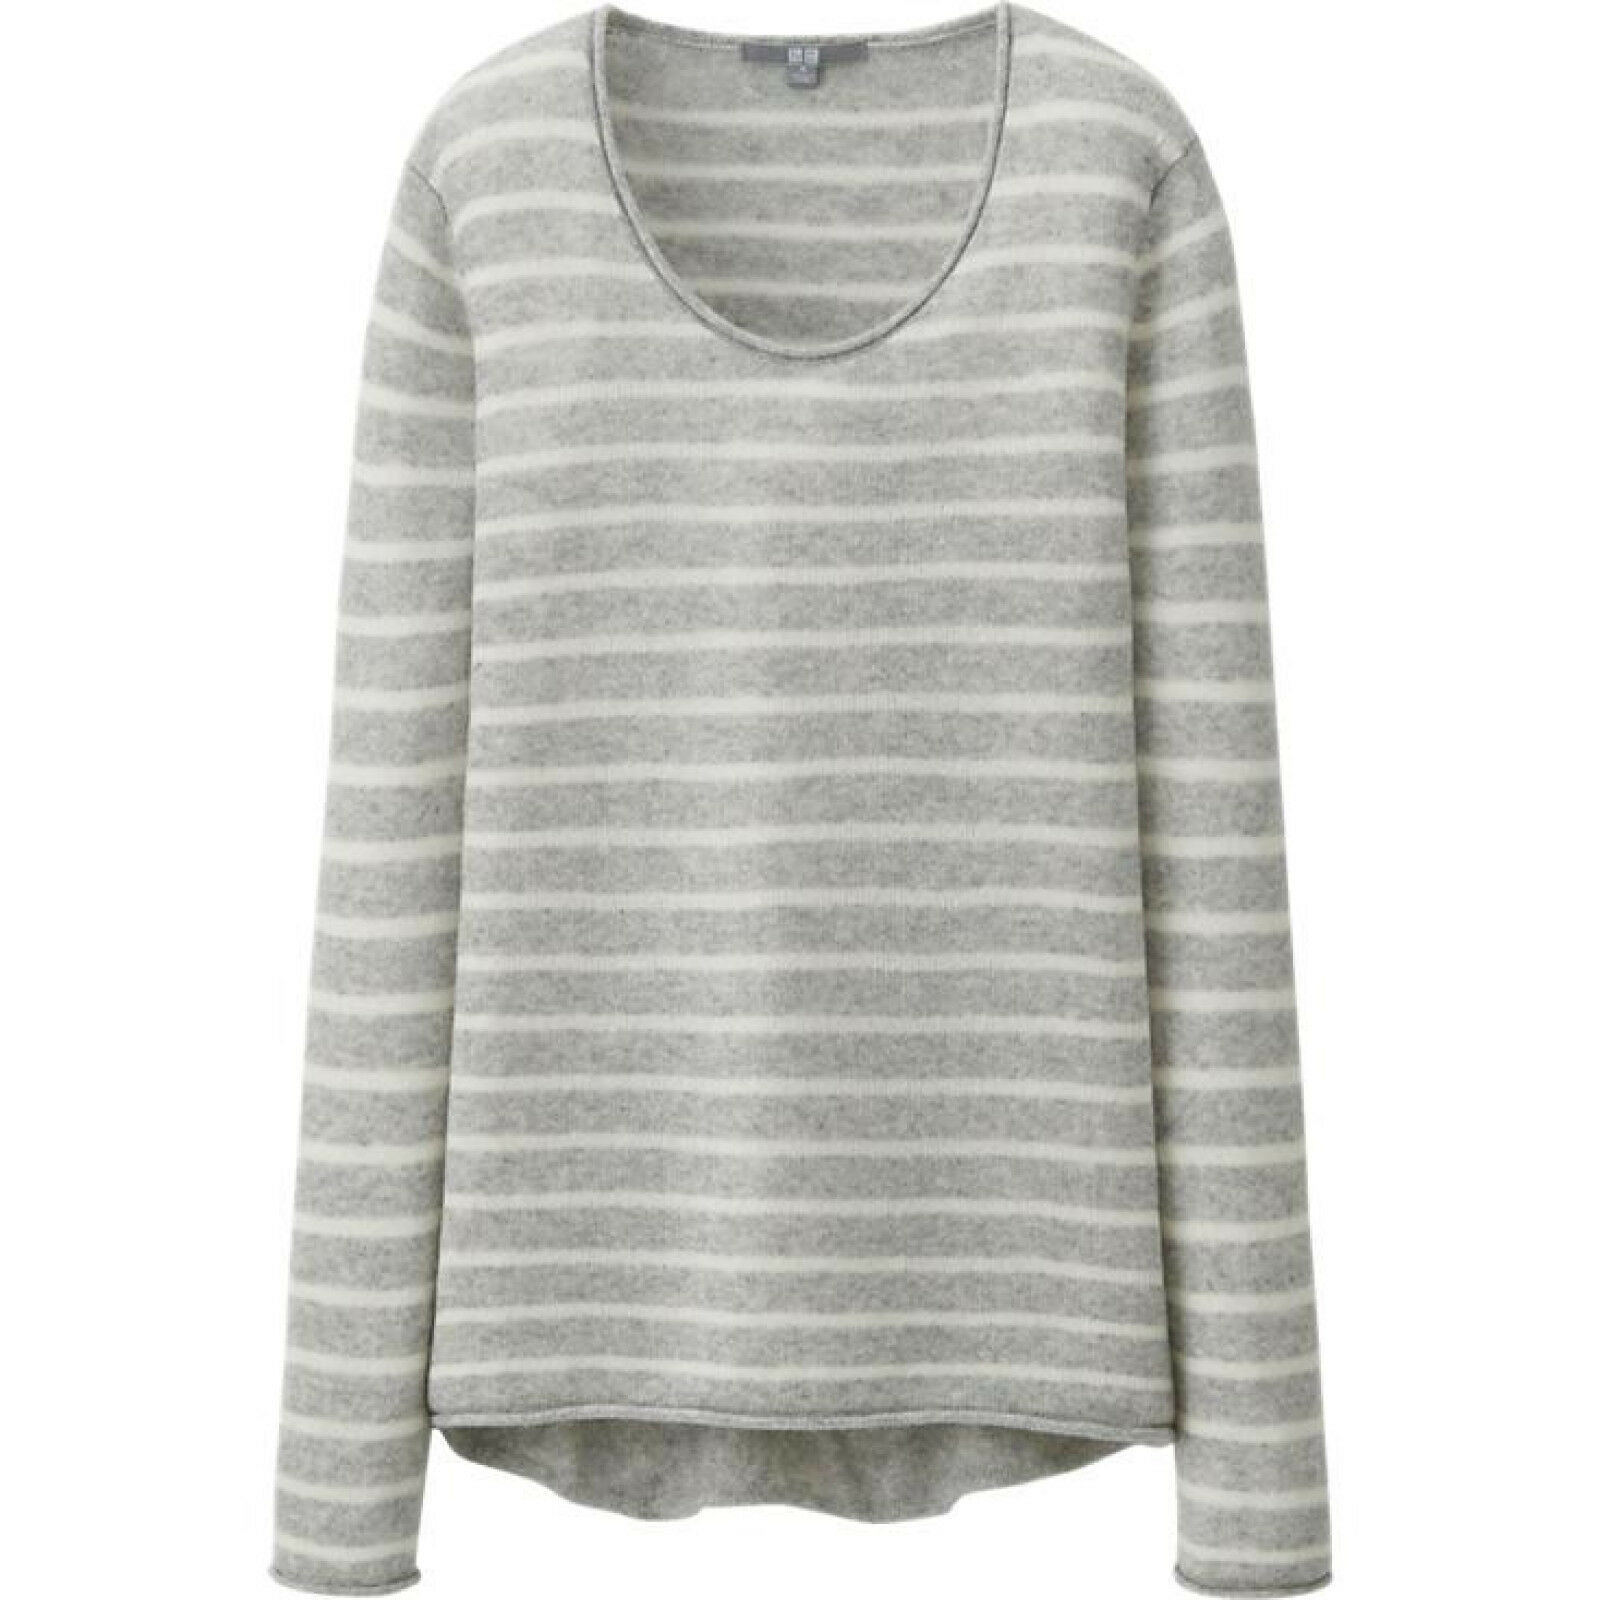 Women Light Cashmere Striped Sweater